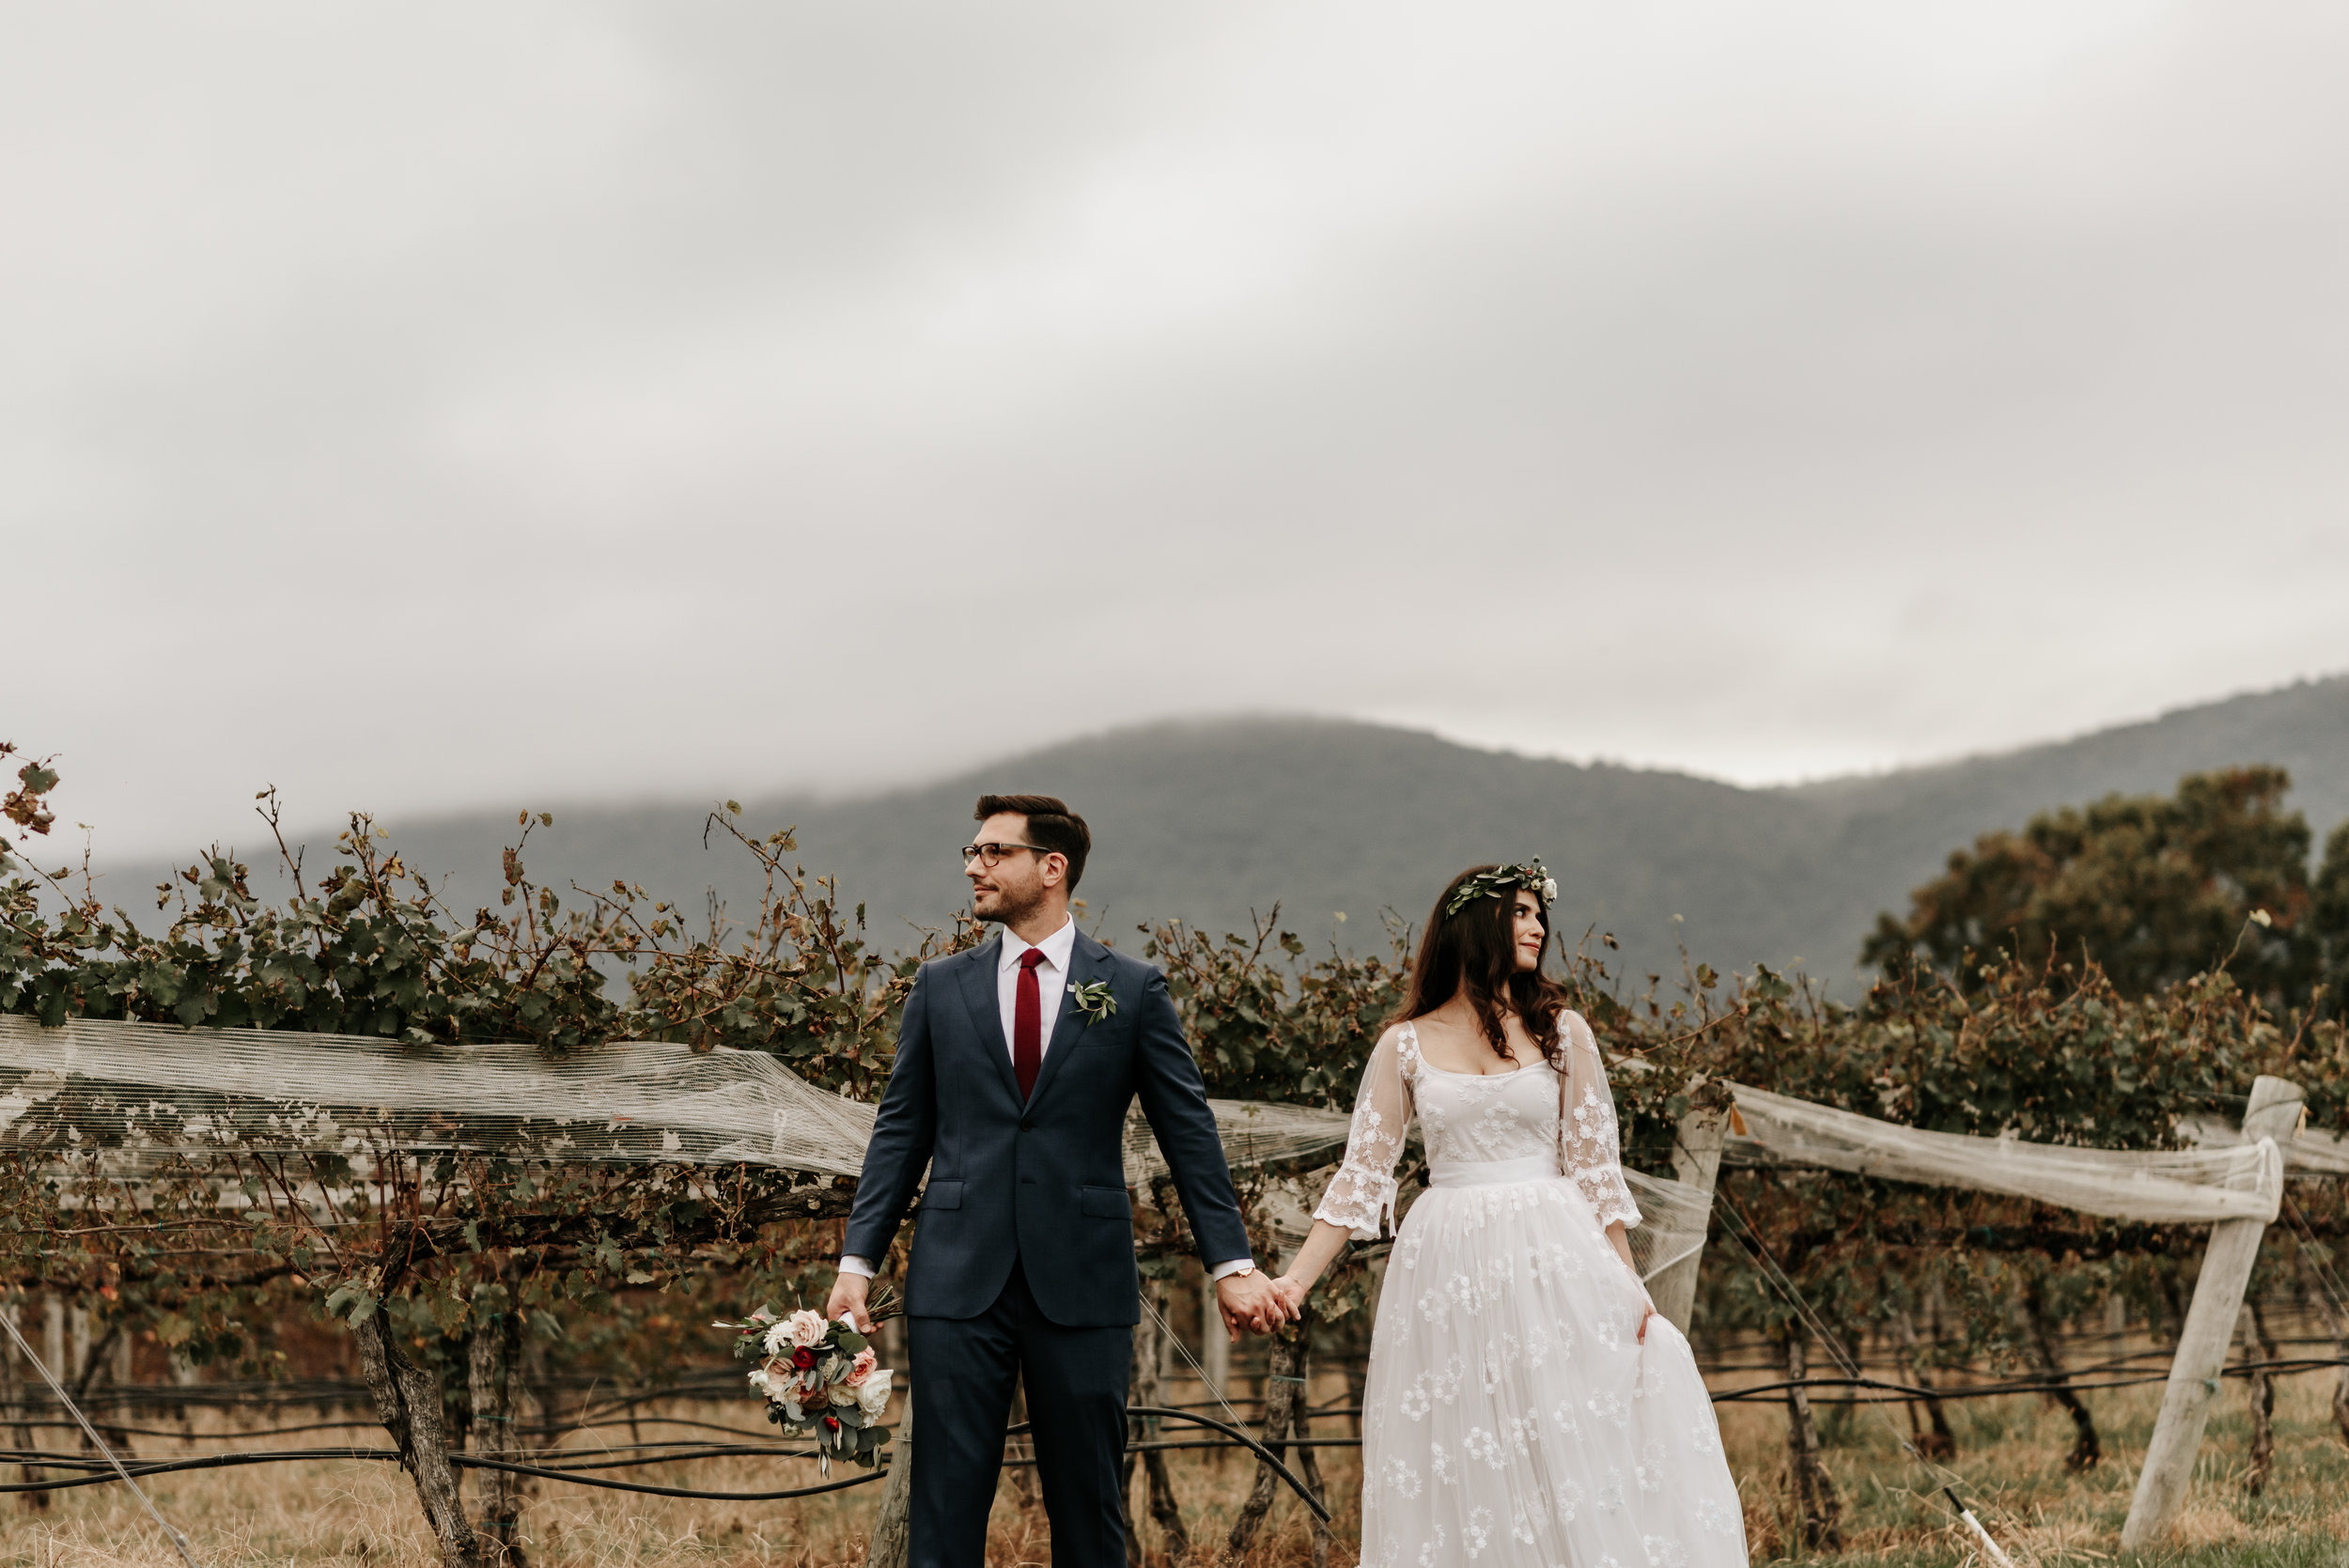 Veritas-Vineyards-and-Winery-Wedding-Photography-Afton-Virginia-Yasmin-Seth-Photography-by-V-2702.jpg